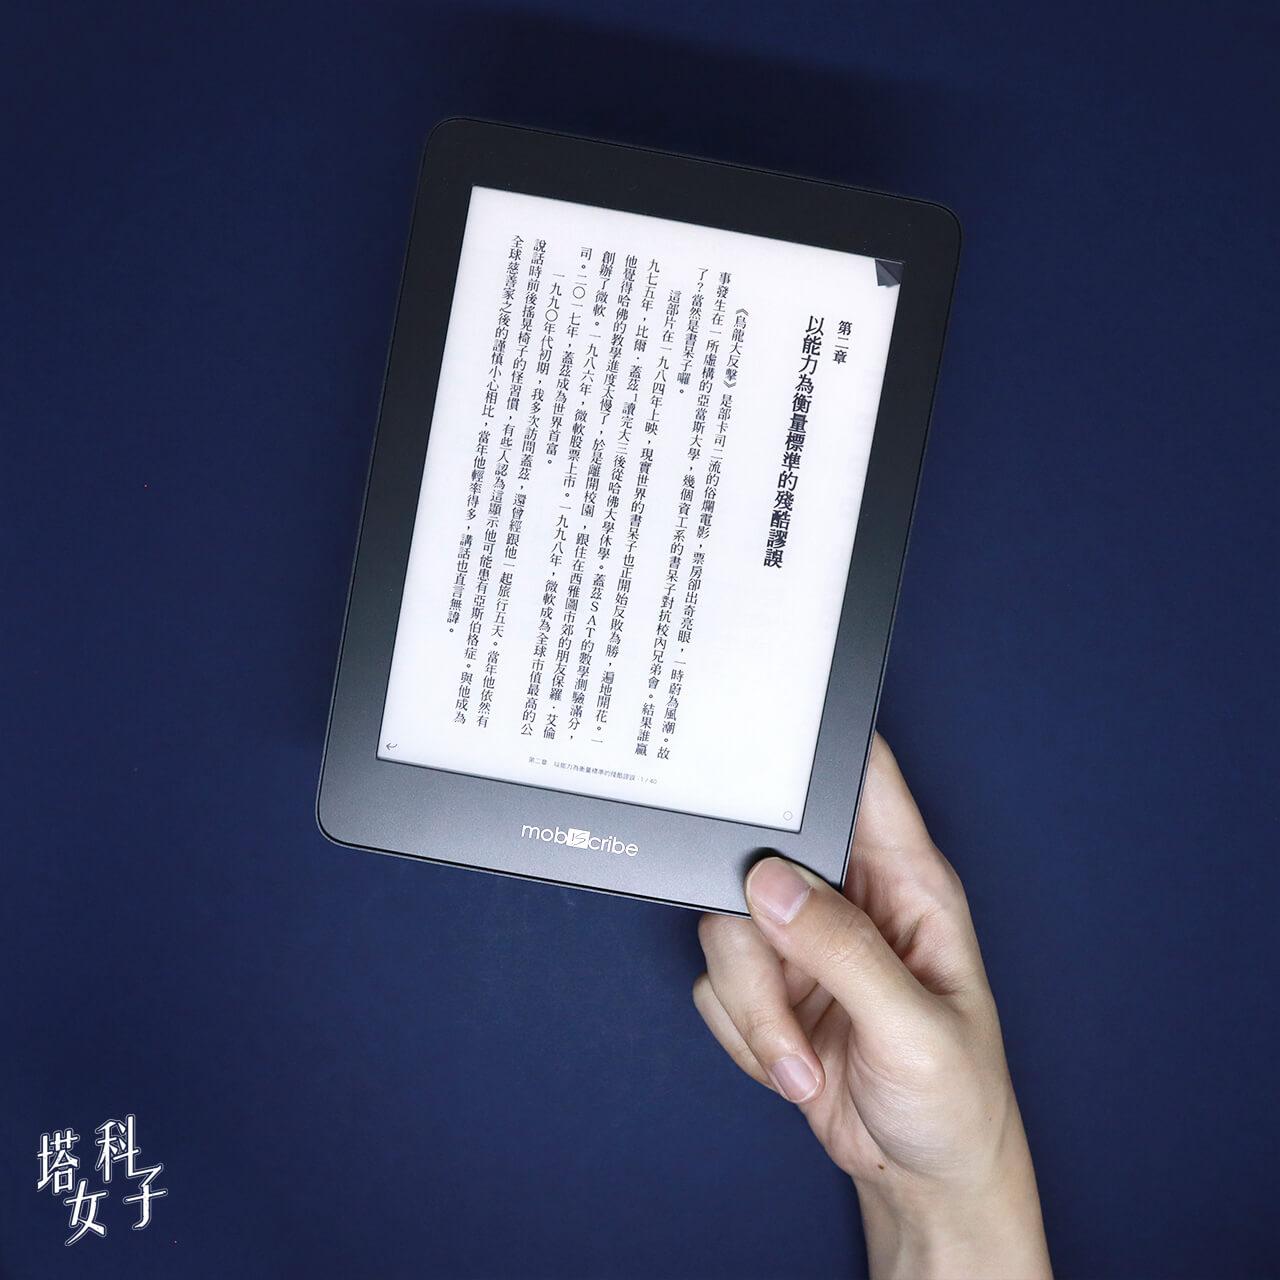 Mobiscribe 電子筆記本/閱讀器 輕巧